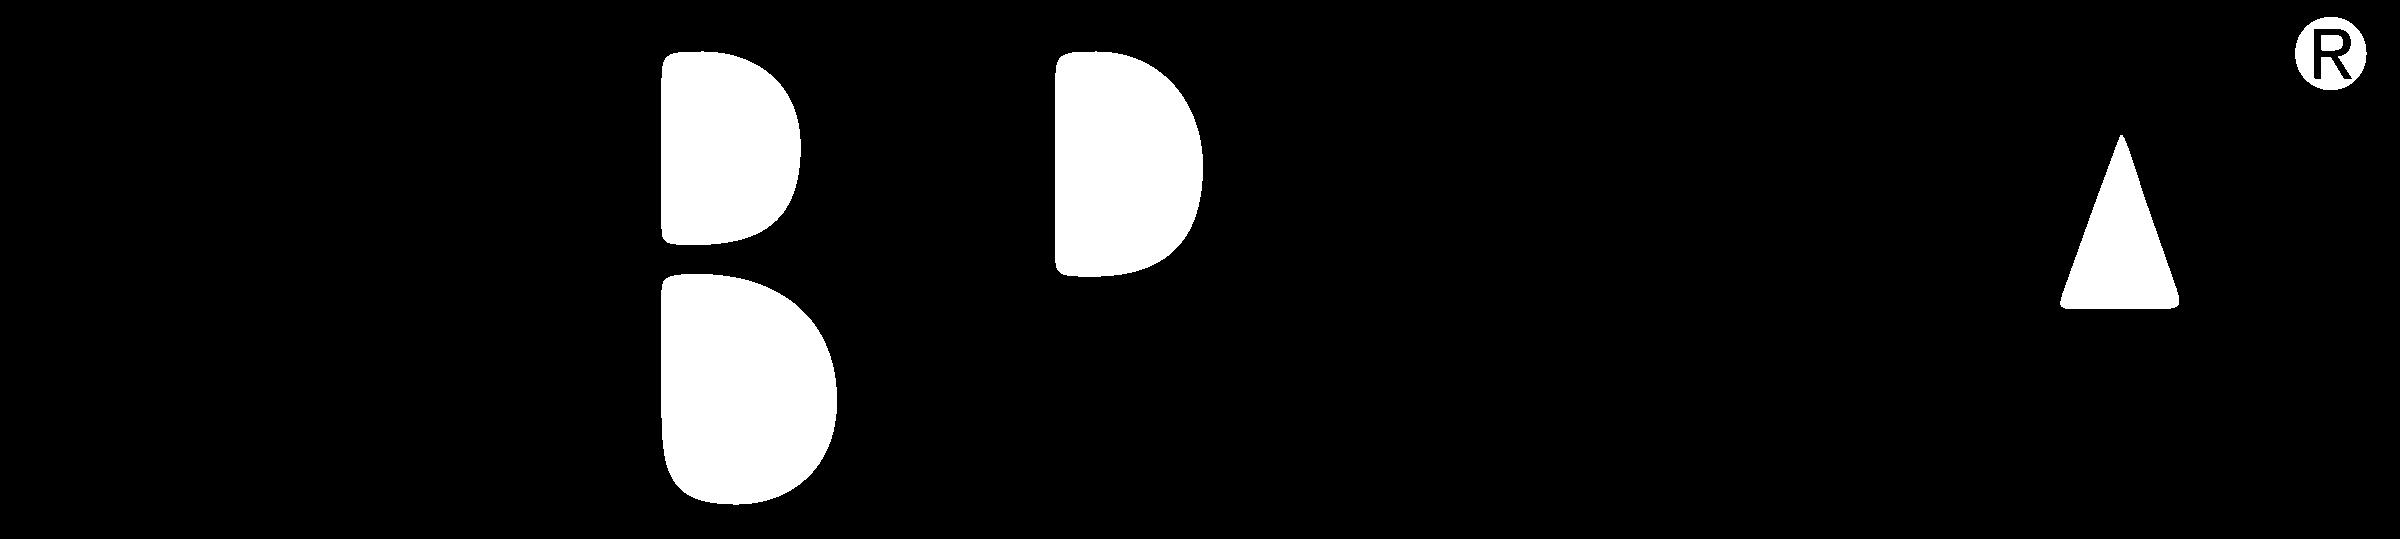 brita-logo-black-and-white.png